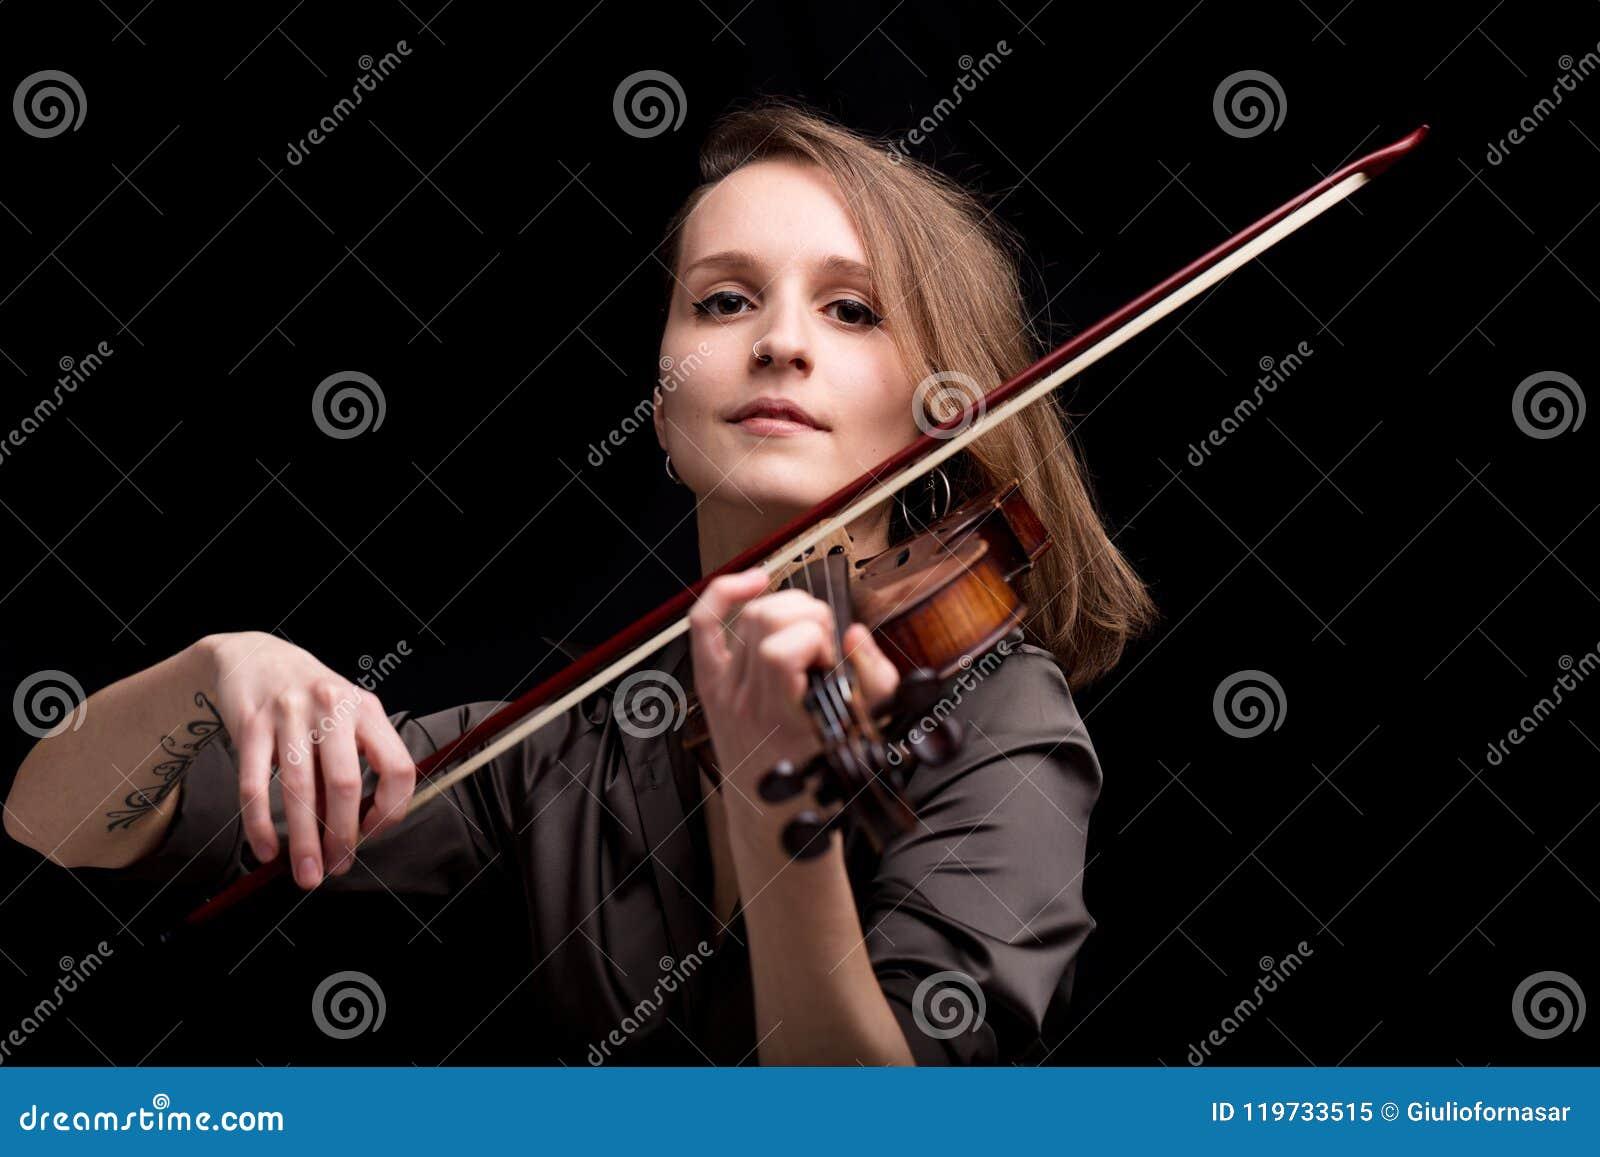 Proud baroque violinist playing folk music